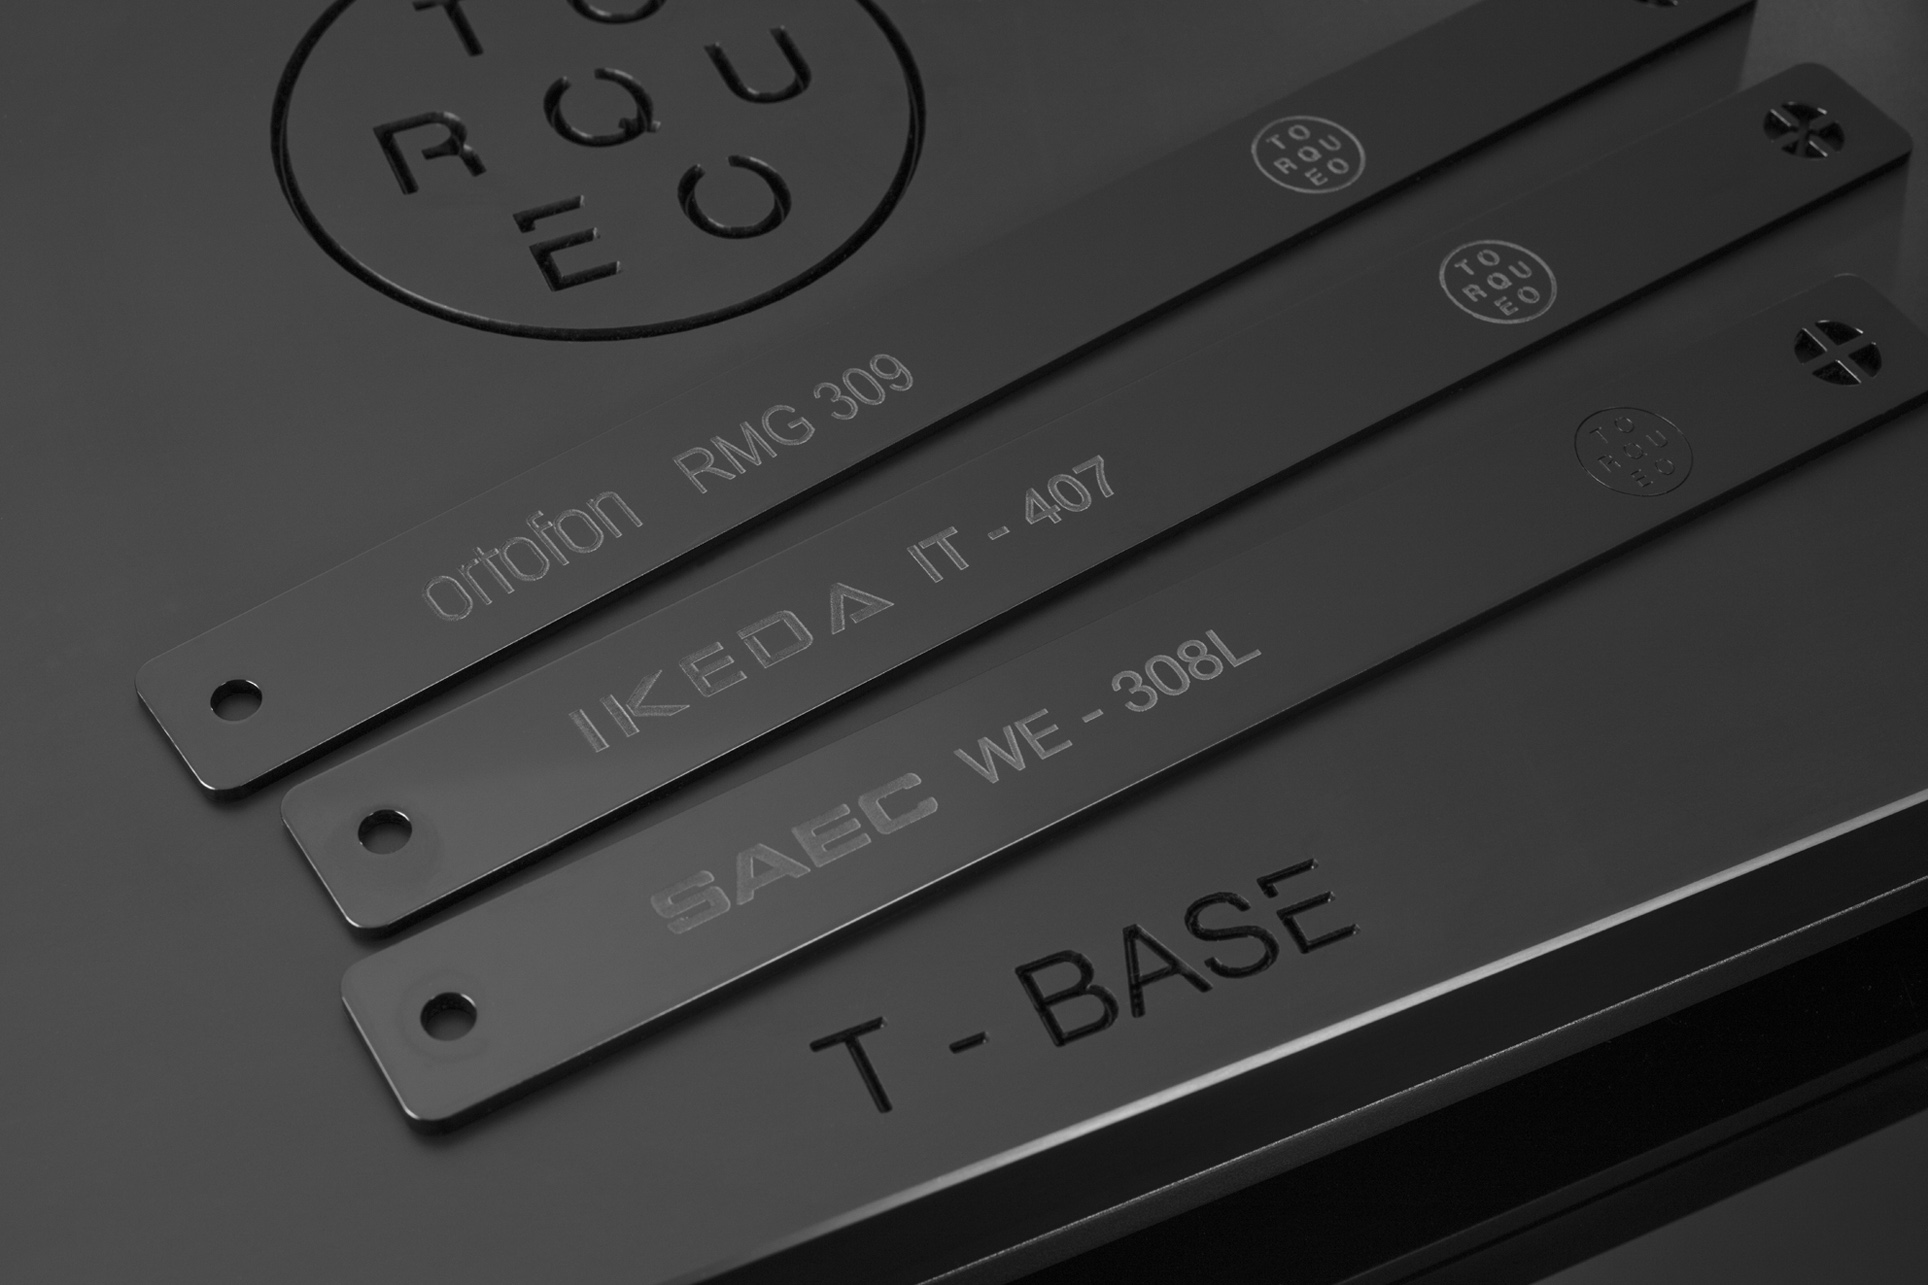 TORQUEO T-BASE 3